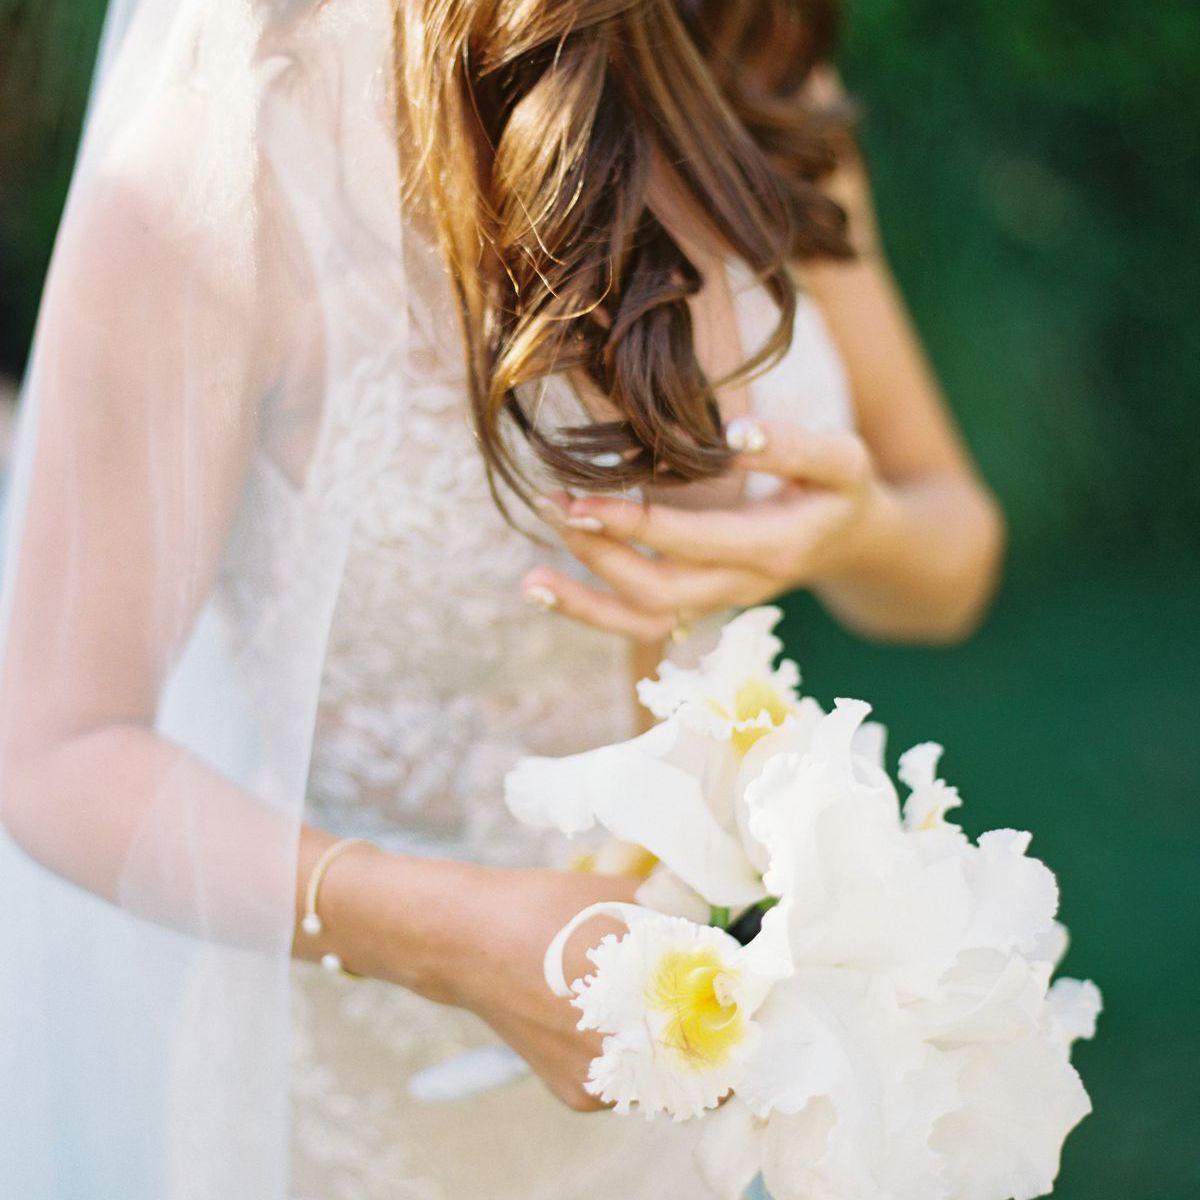 white posy wedding bouquet